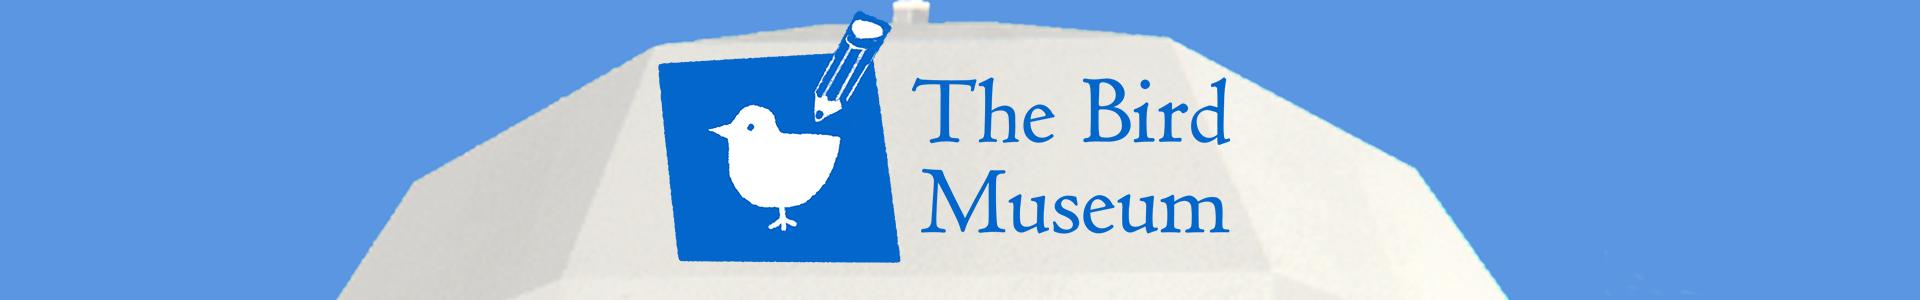 The Bird Museum